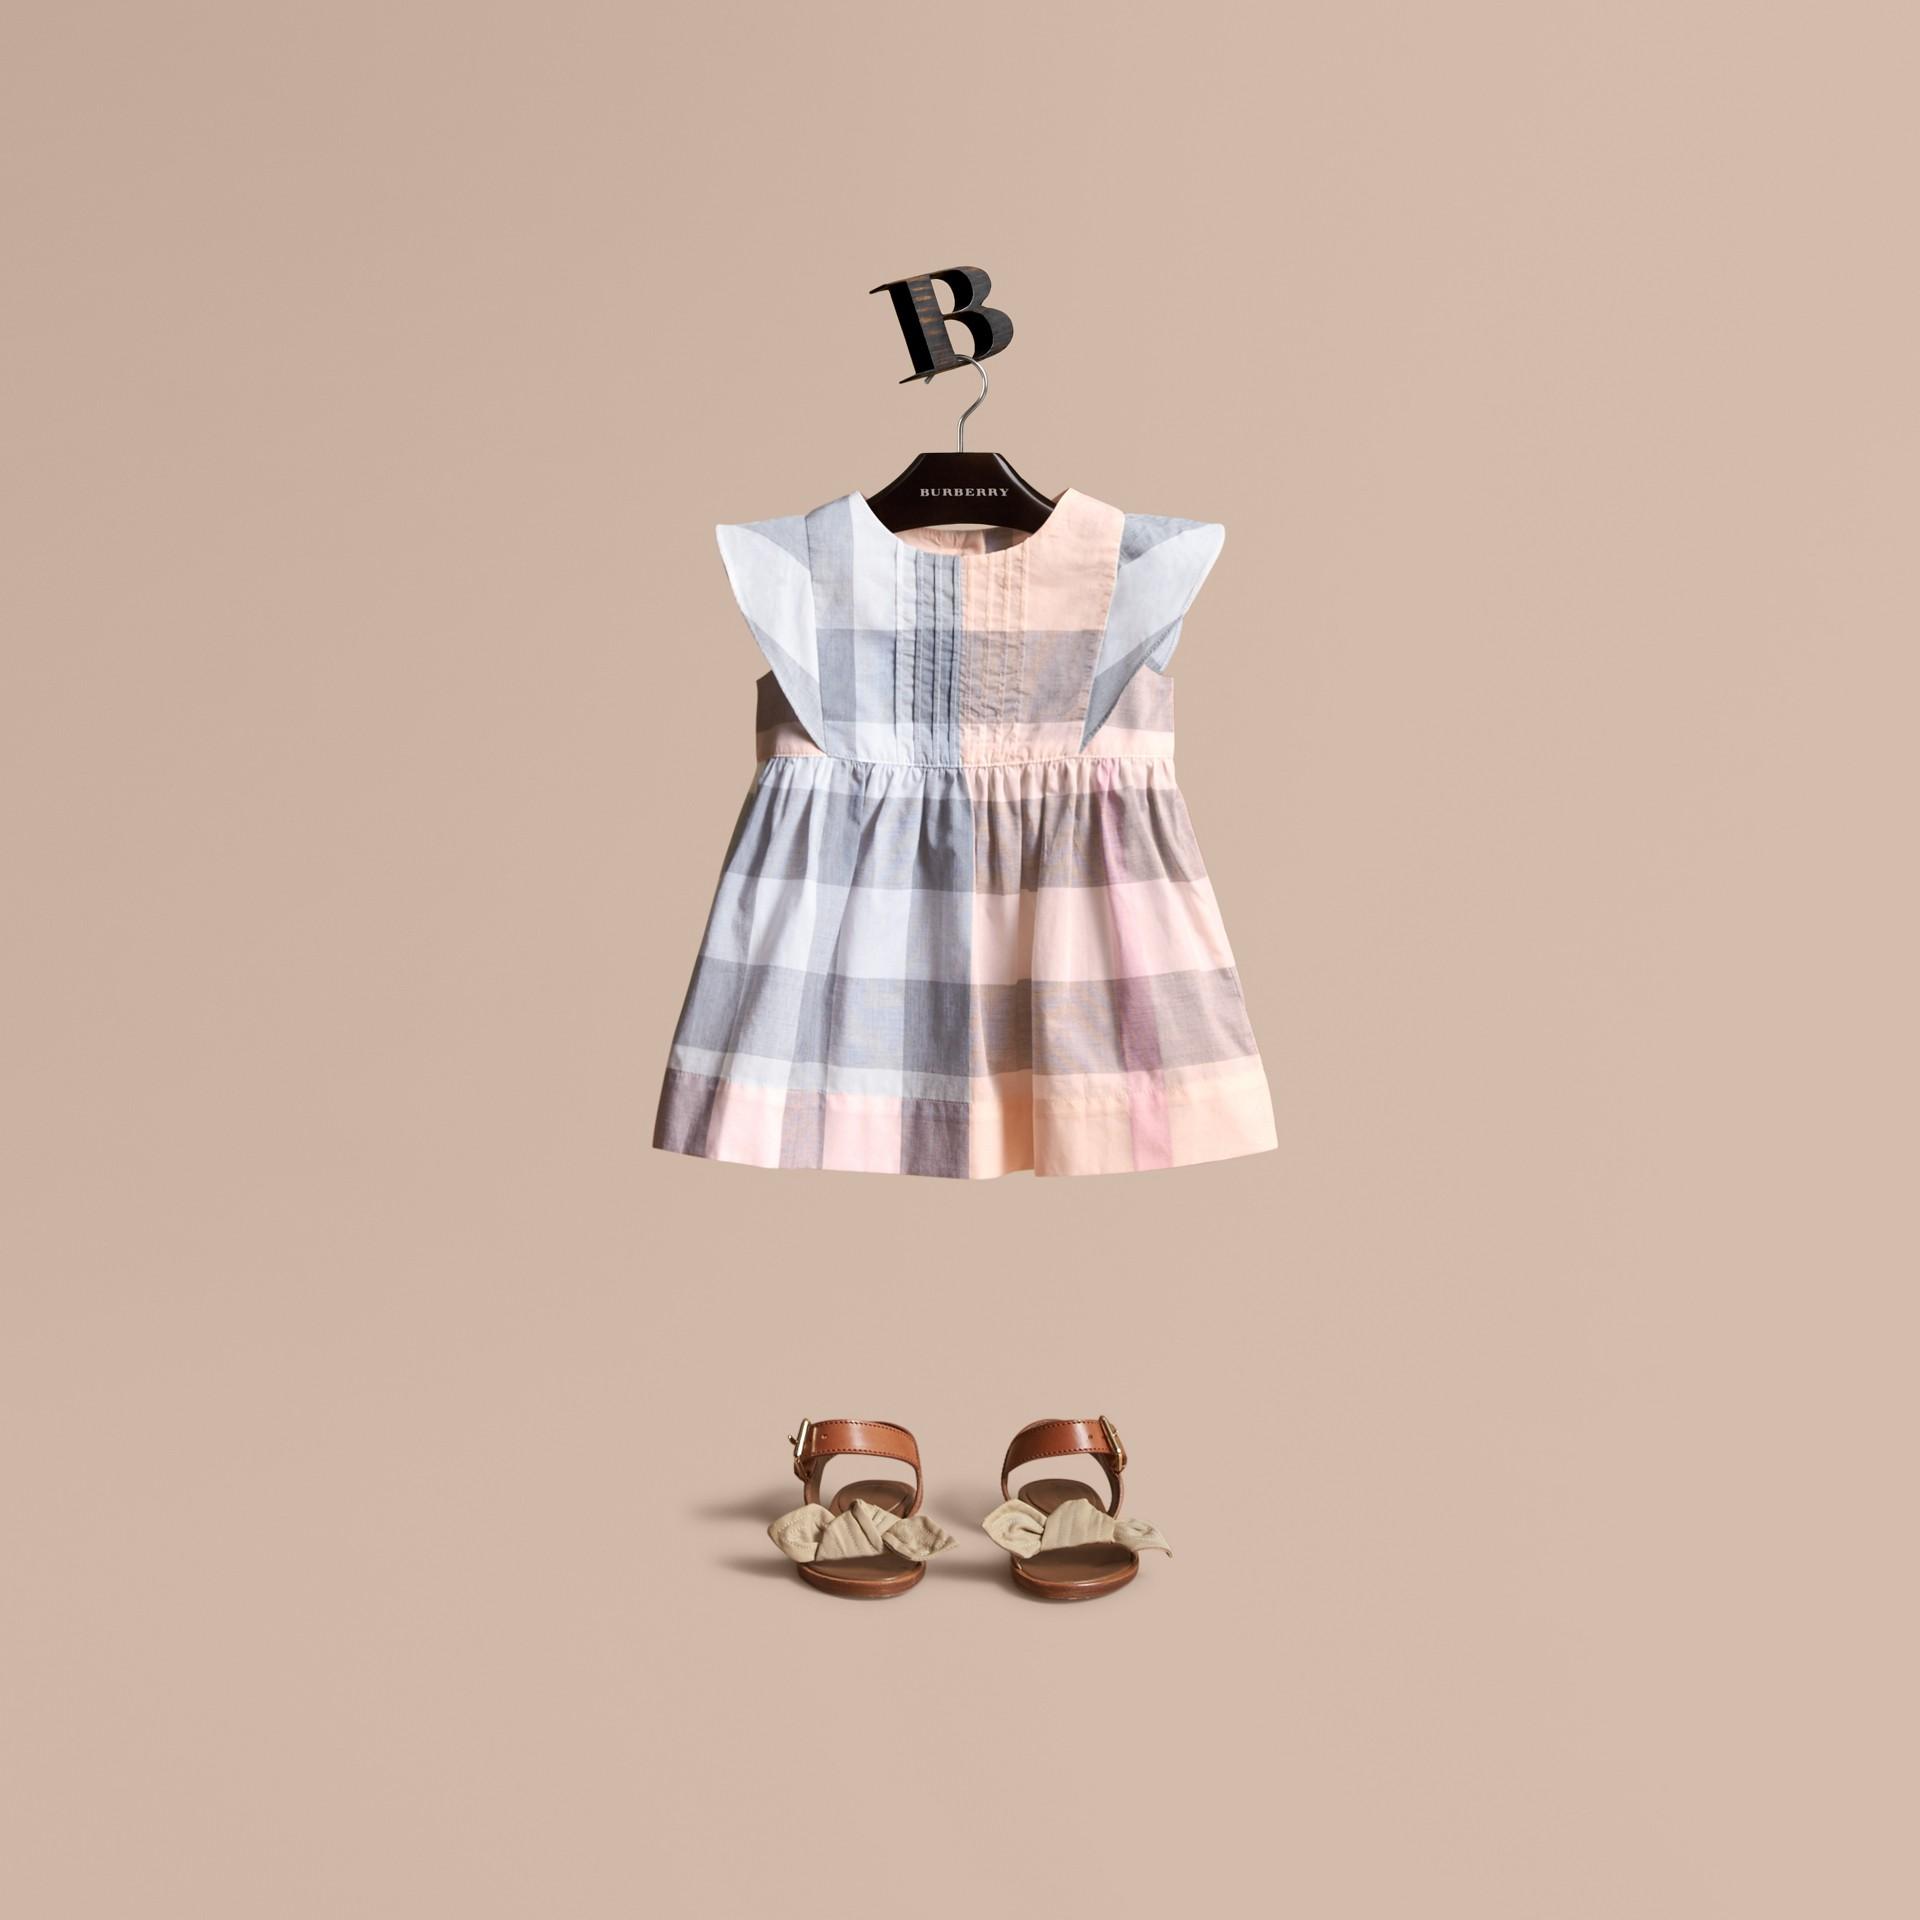 Ruffle Detail Check Cotton Dress Apricot - gallery image 1